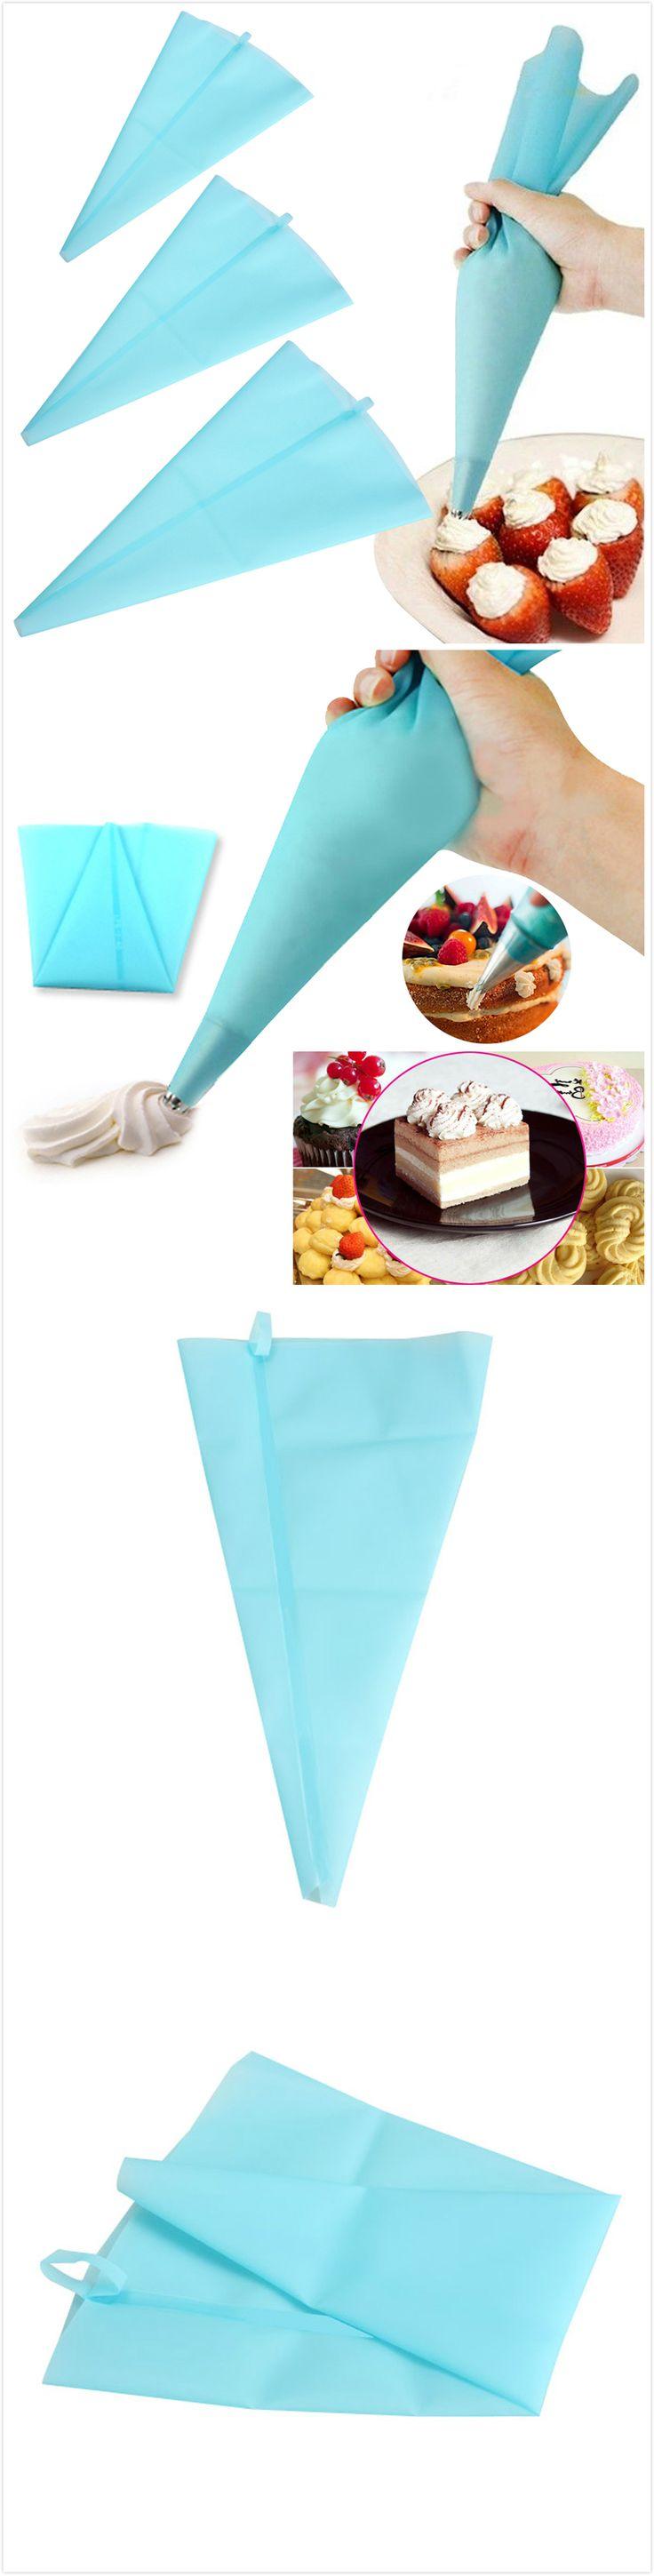 13 best Cake Mould images on Pinterest | Cake mold, Cooking utensils ...